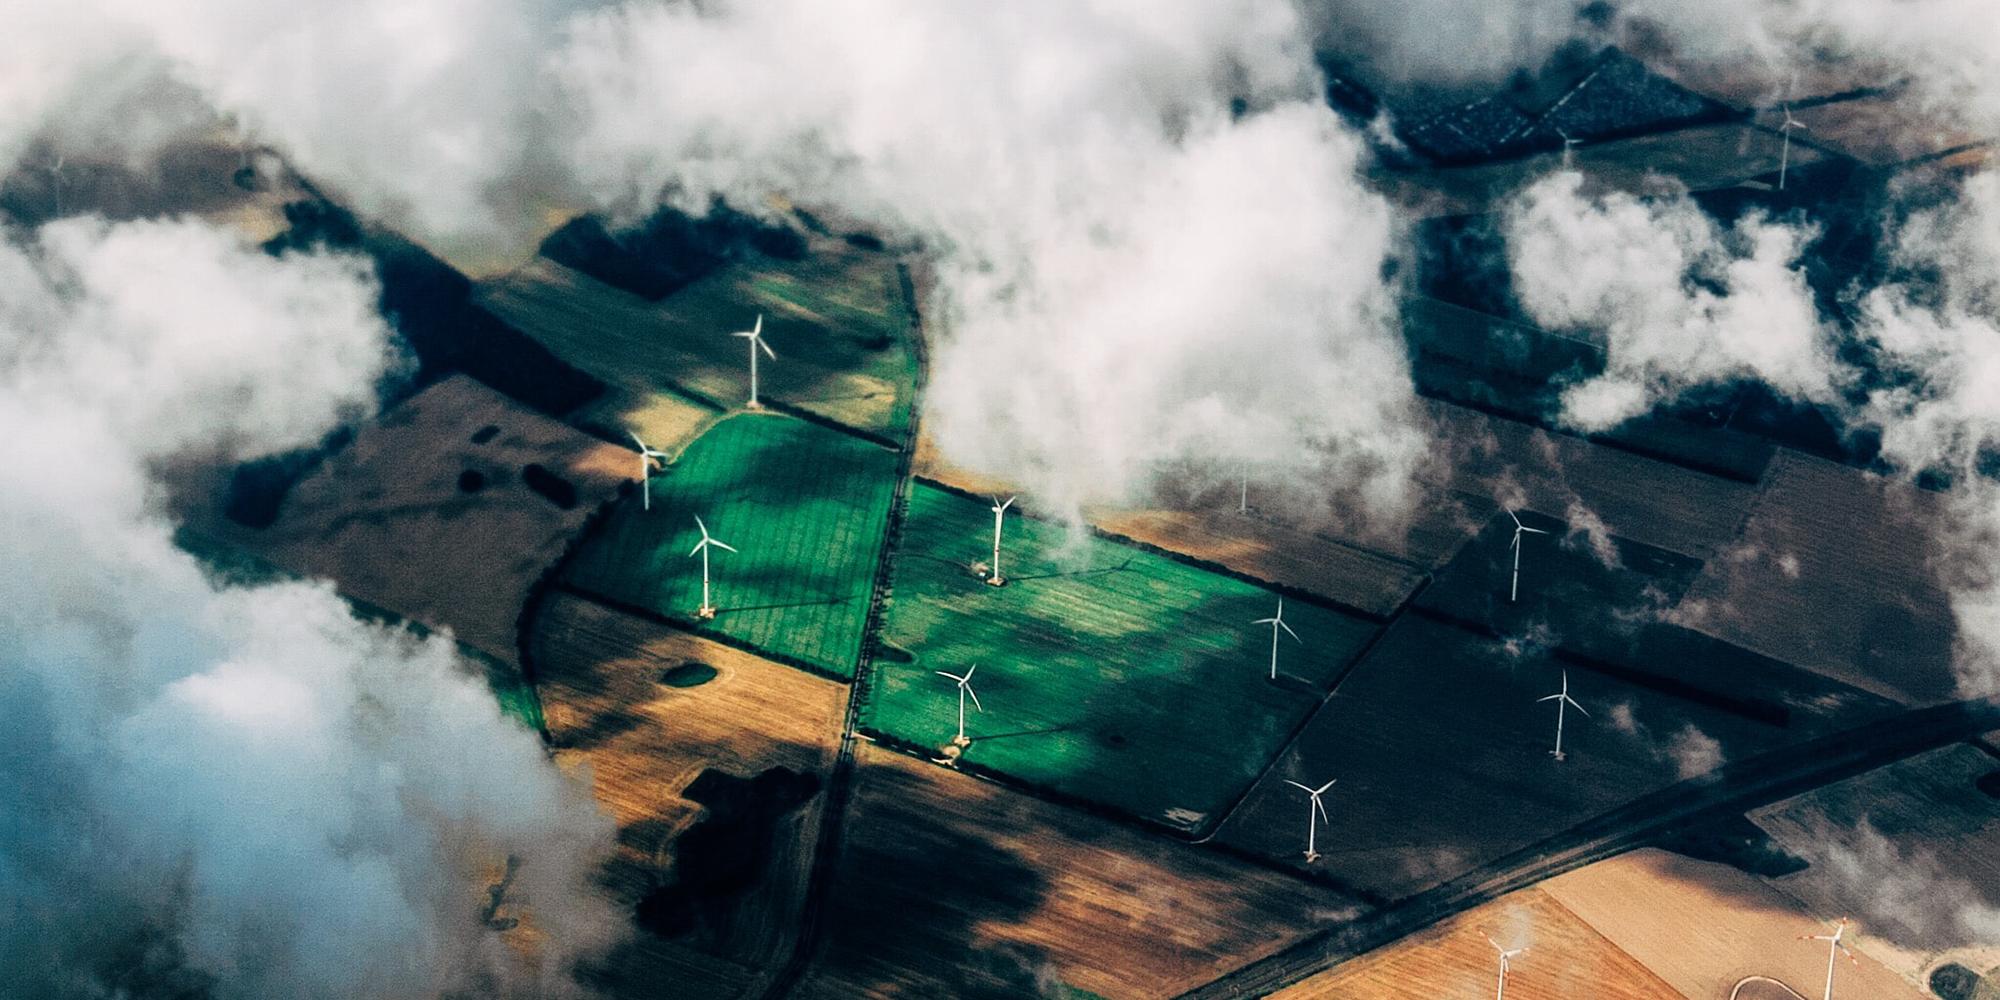 Wind turbines fields clouds